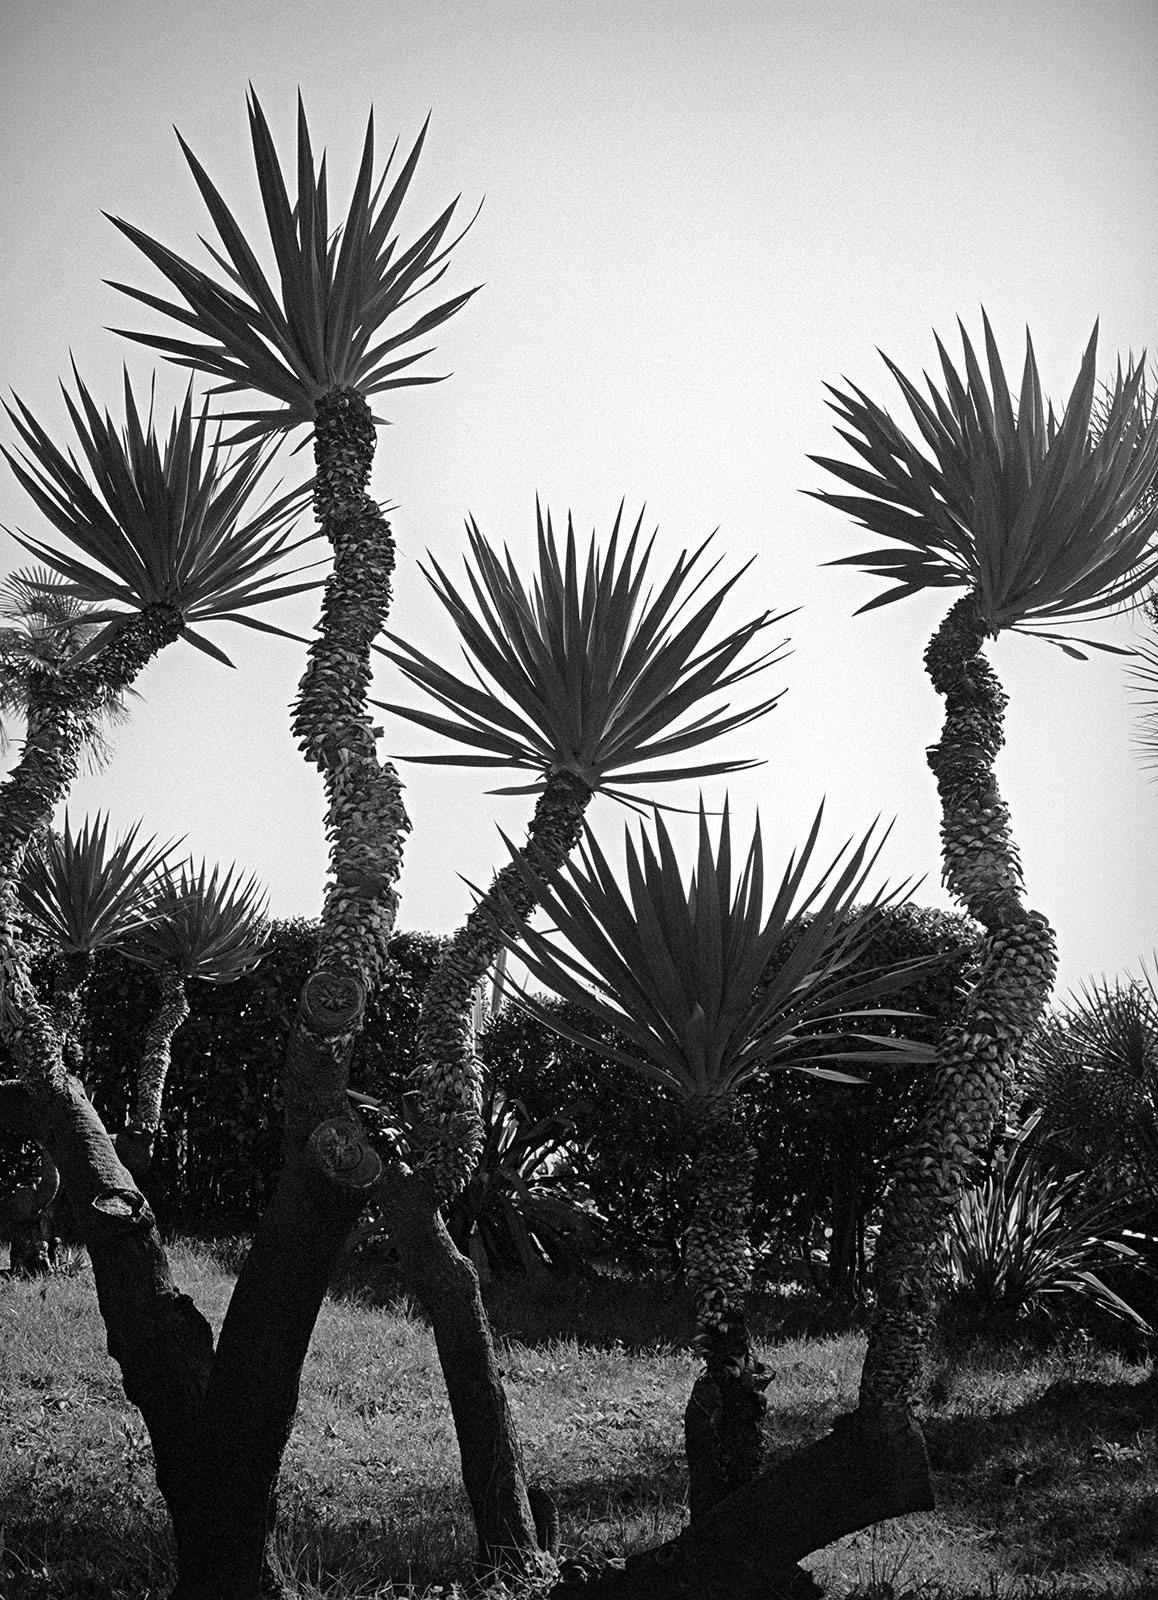 Sculptured plants